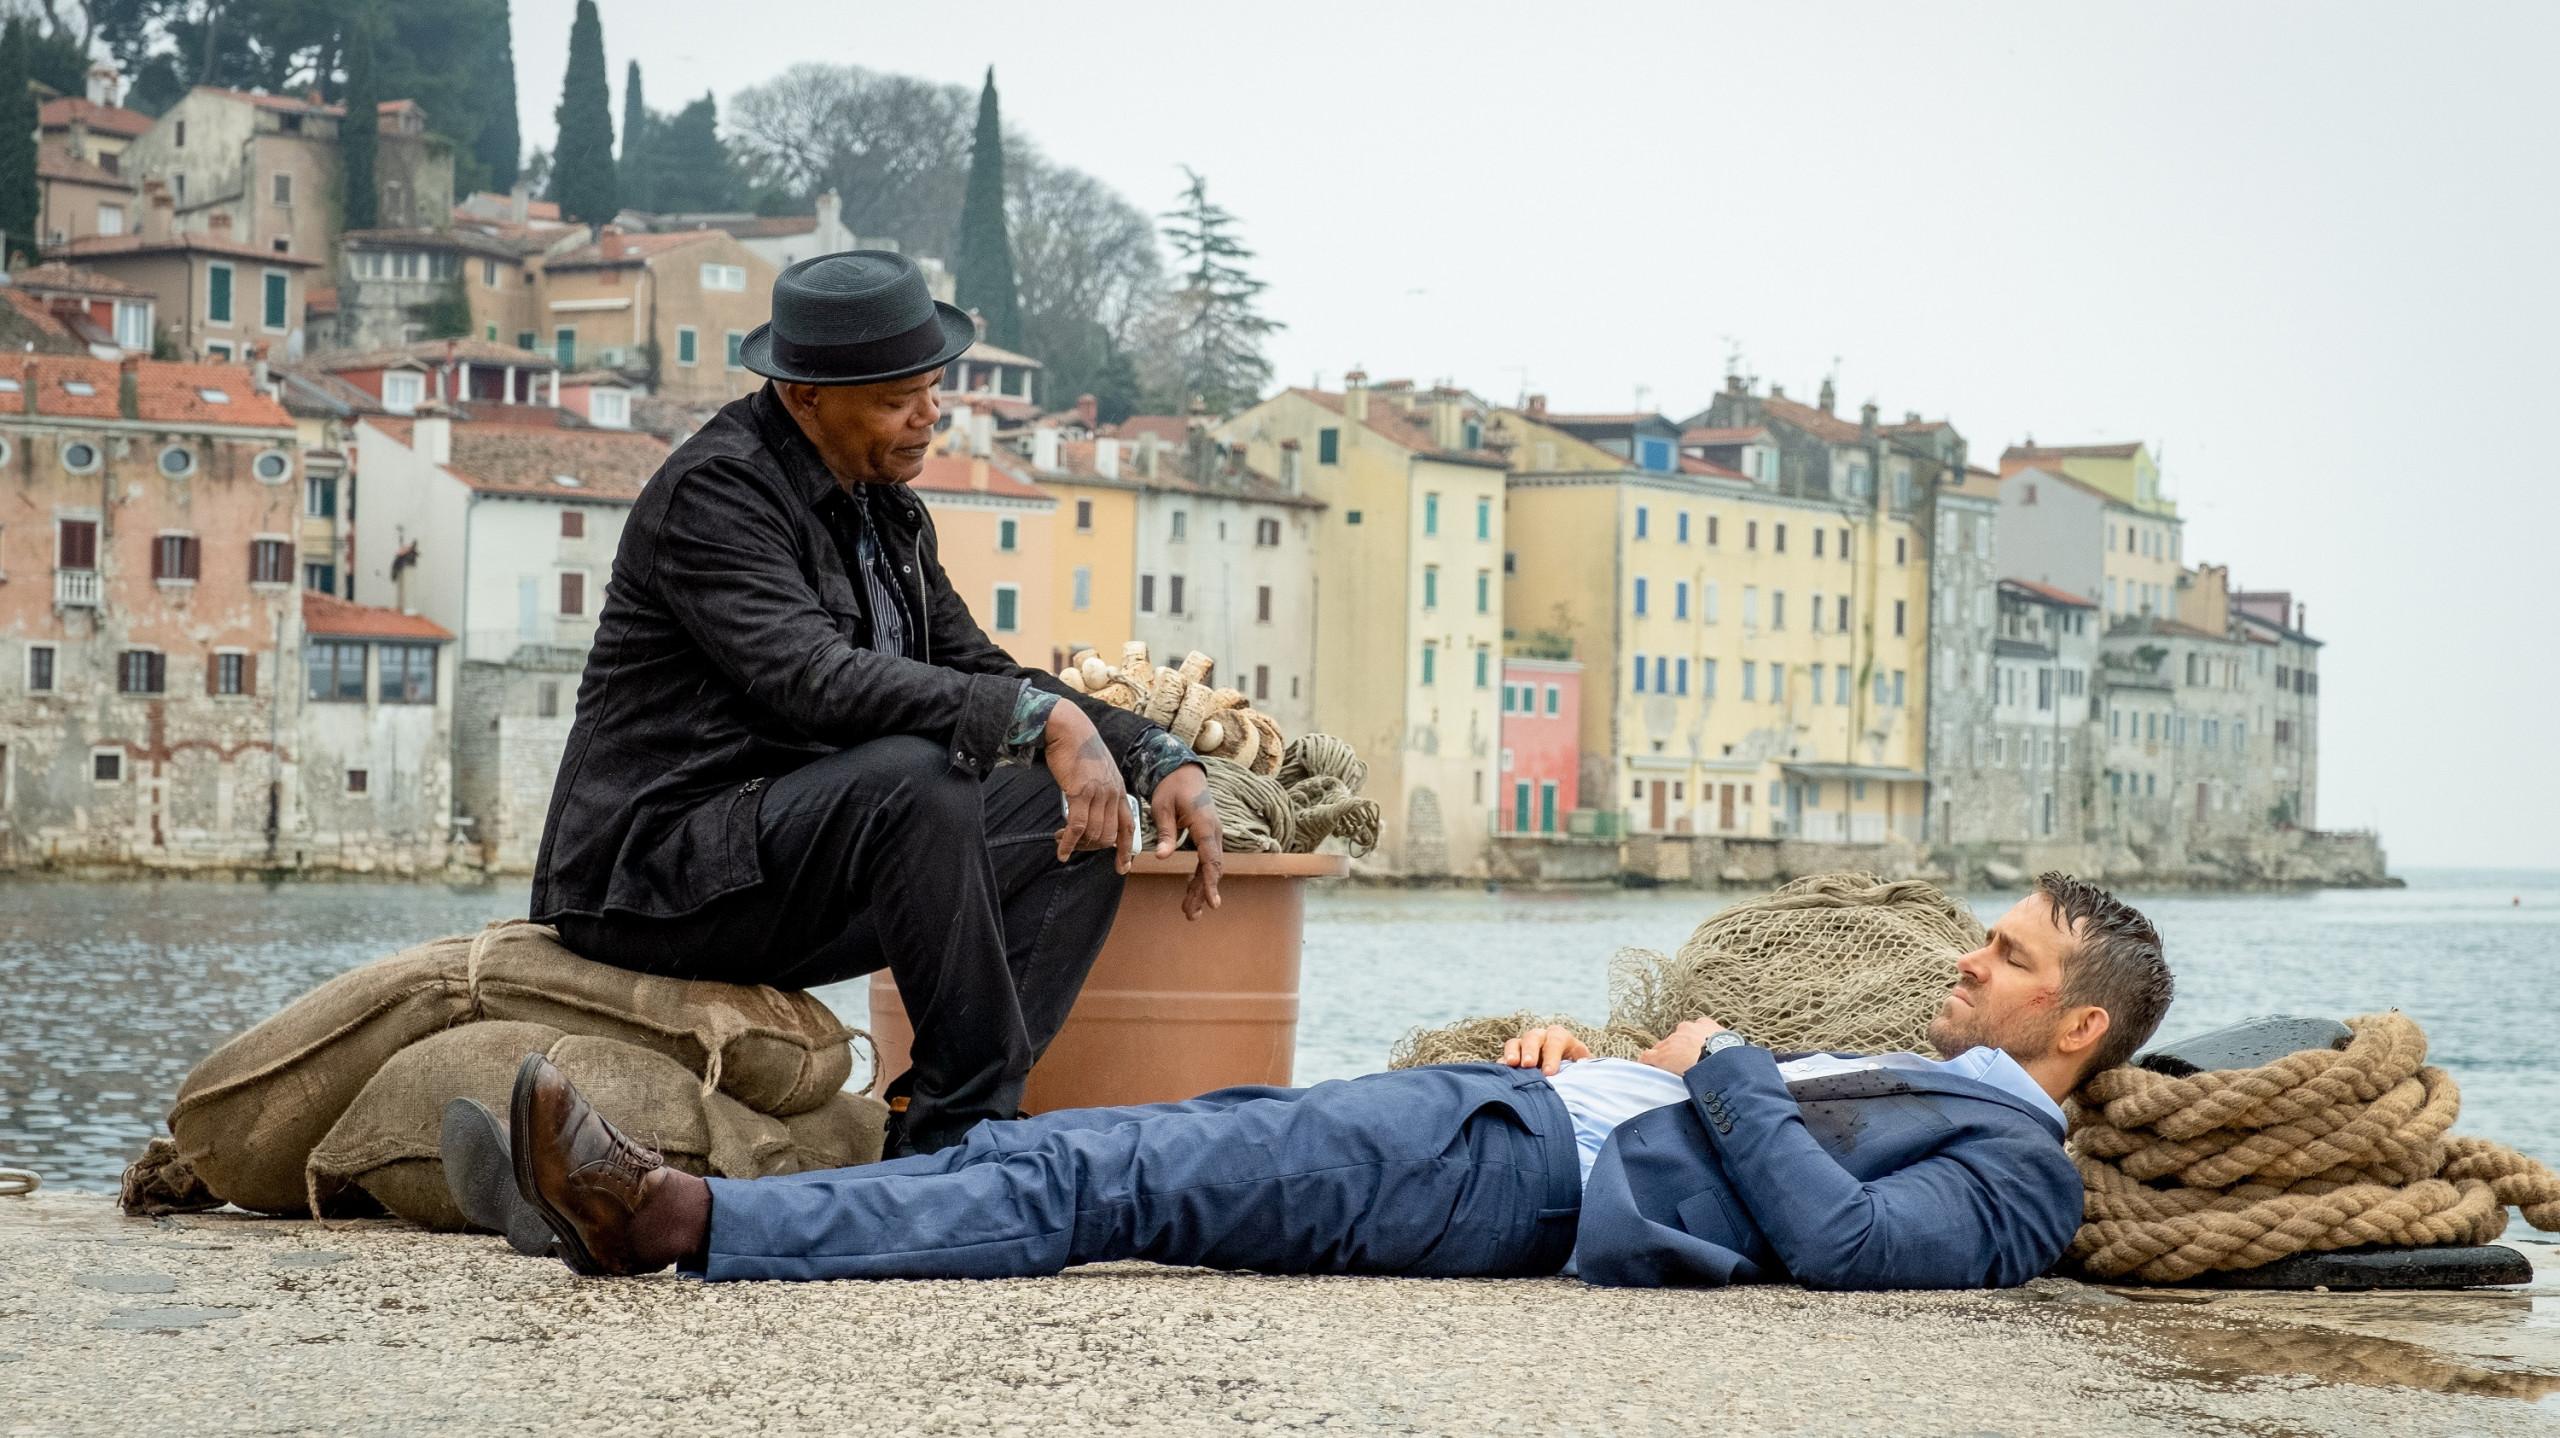 Samuel L. Jackson as Darius Kincaid and Ryan Reynolds as Michael Bryce in The Hitman's Wife's Bodyguard // Credit: Millennium Media